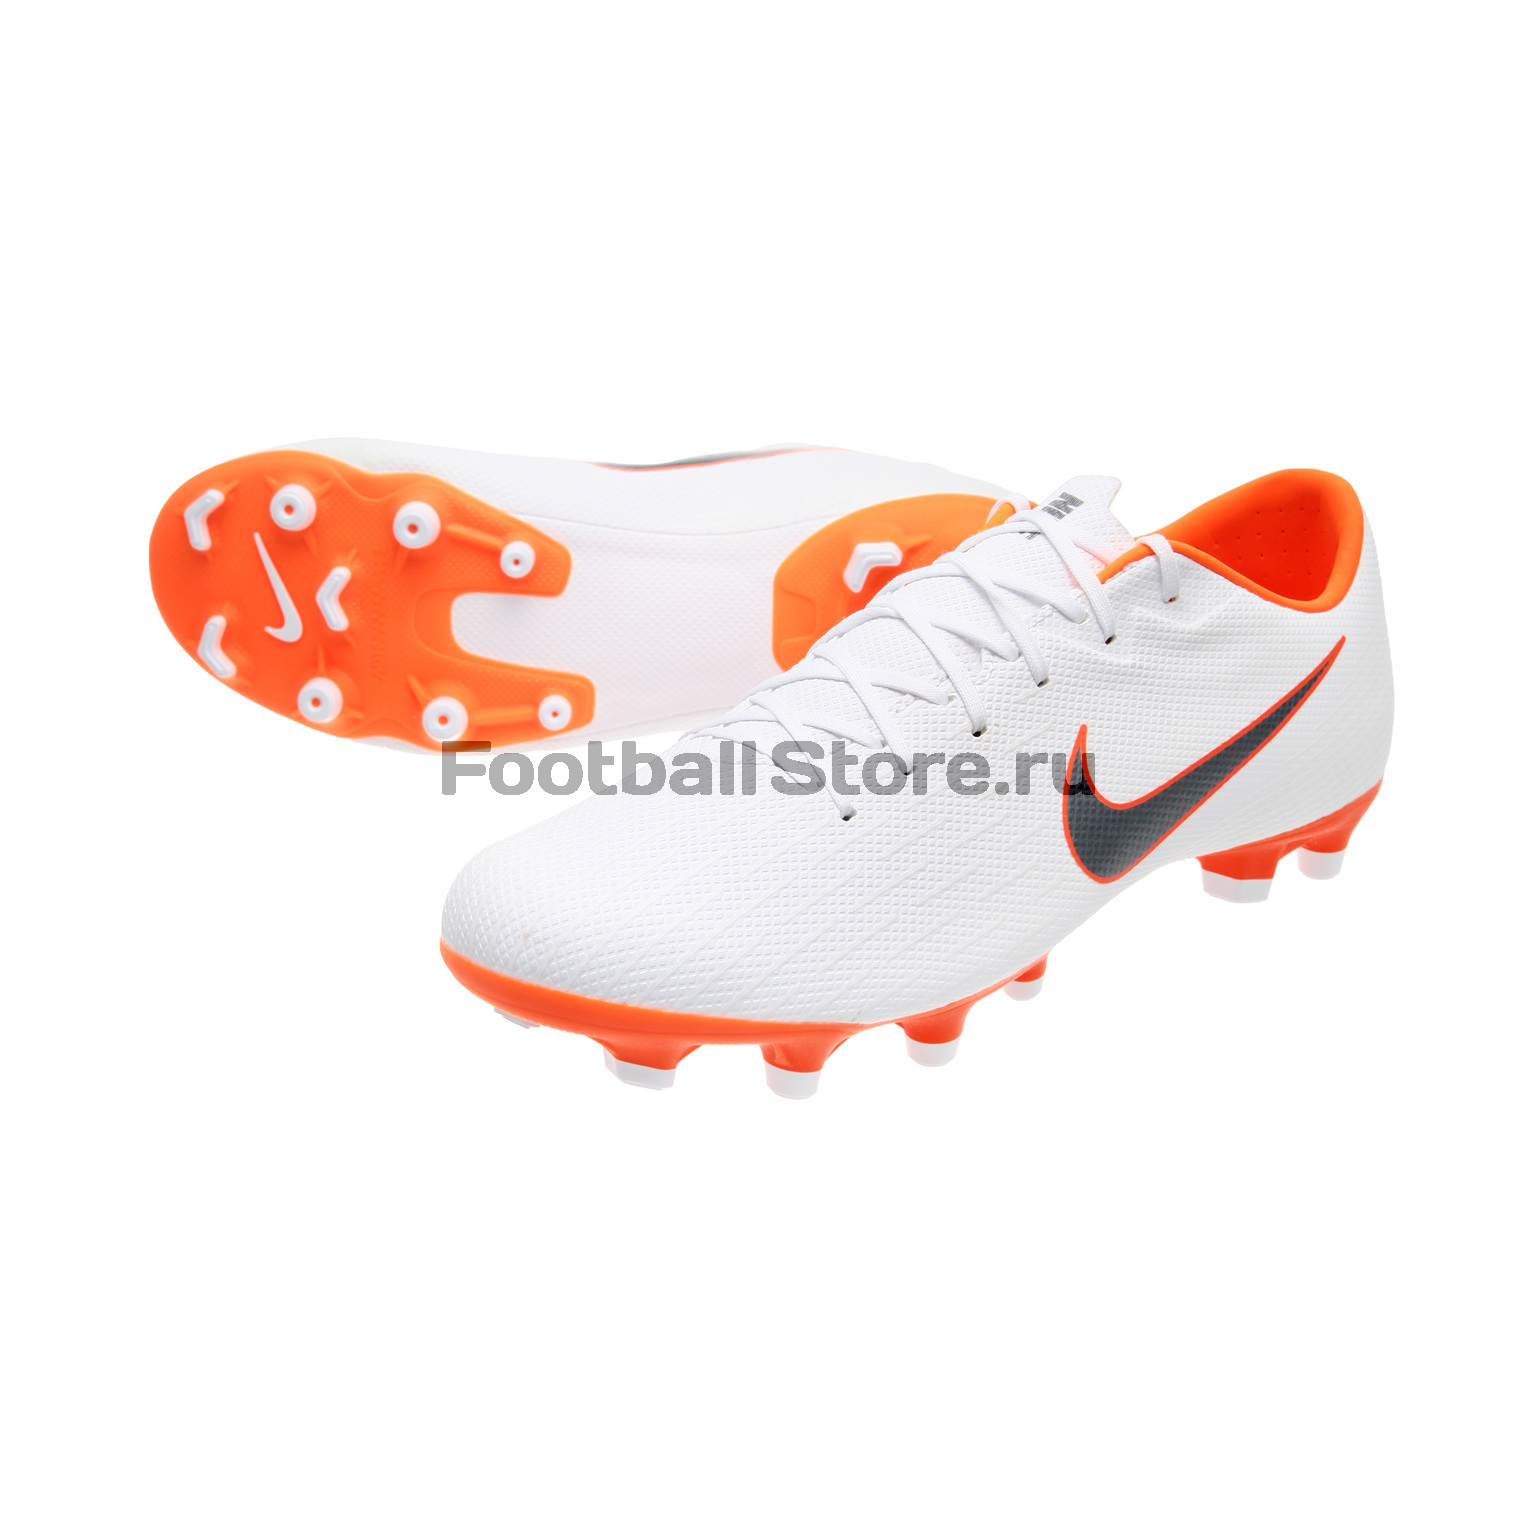 Бутсы Nike Vapor 12 Academy FG/MG AH7375-107 бутсы nike mercurial victory iii fg 509128 800